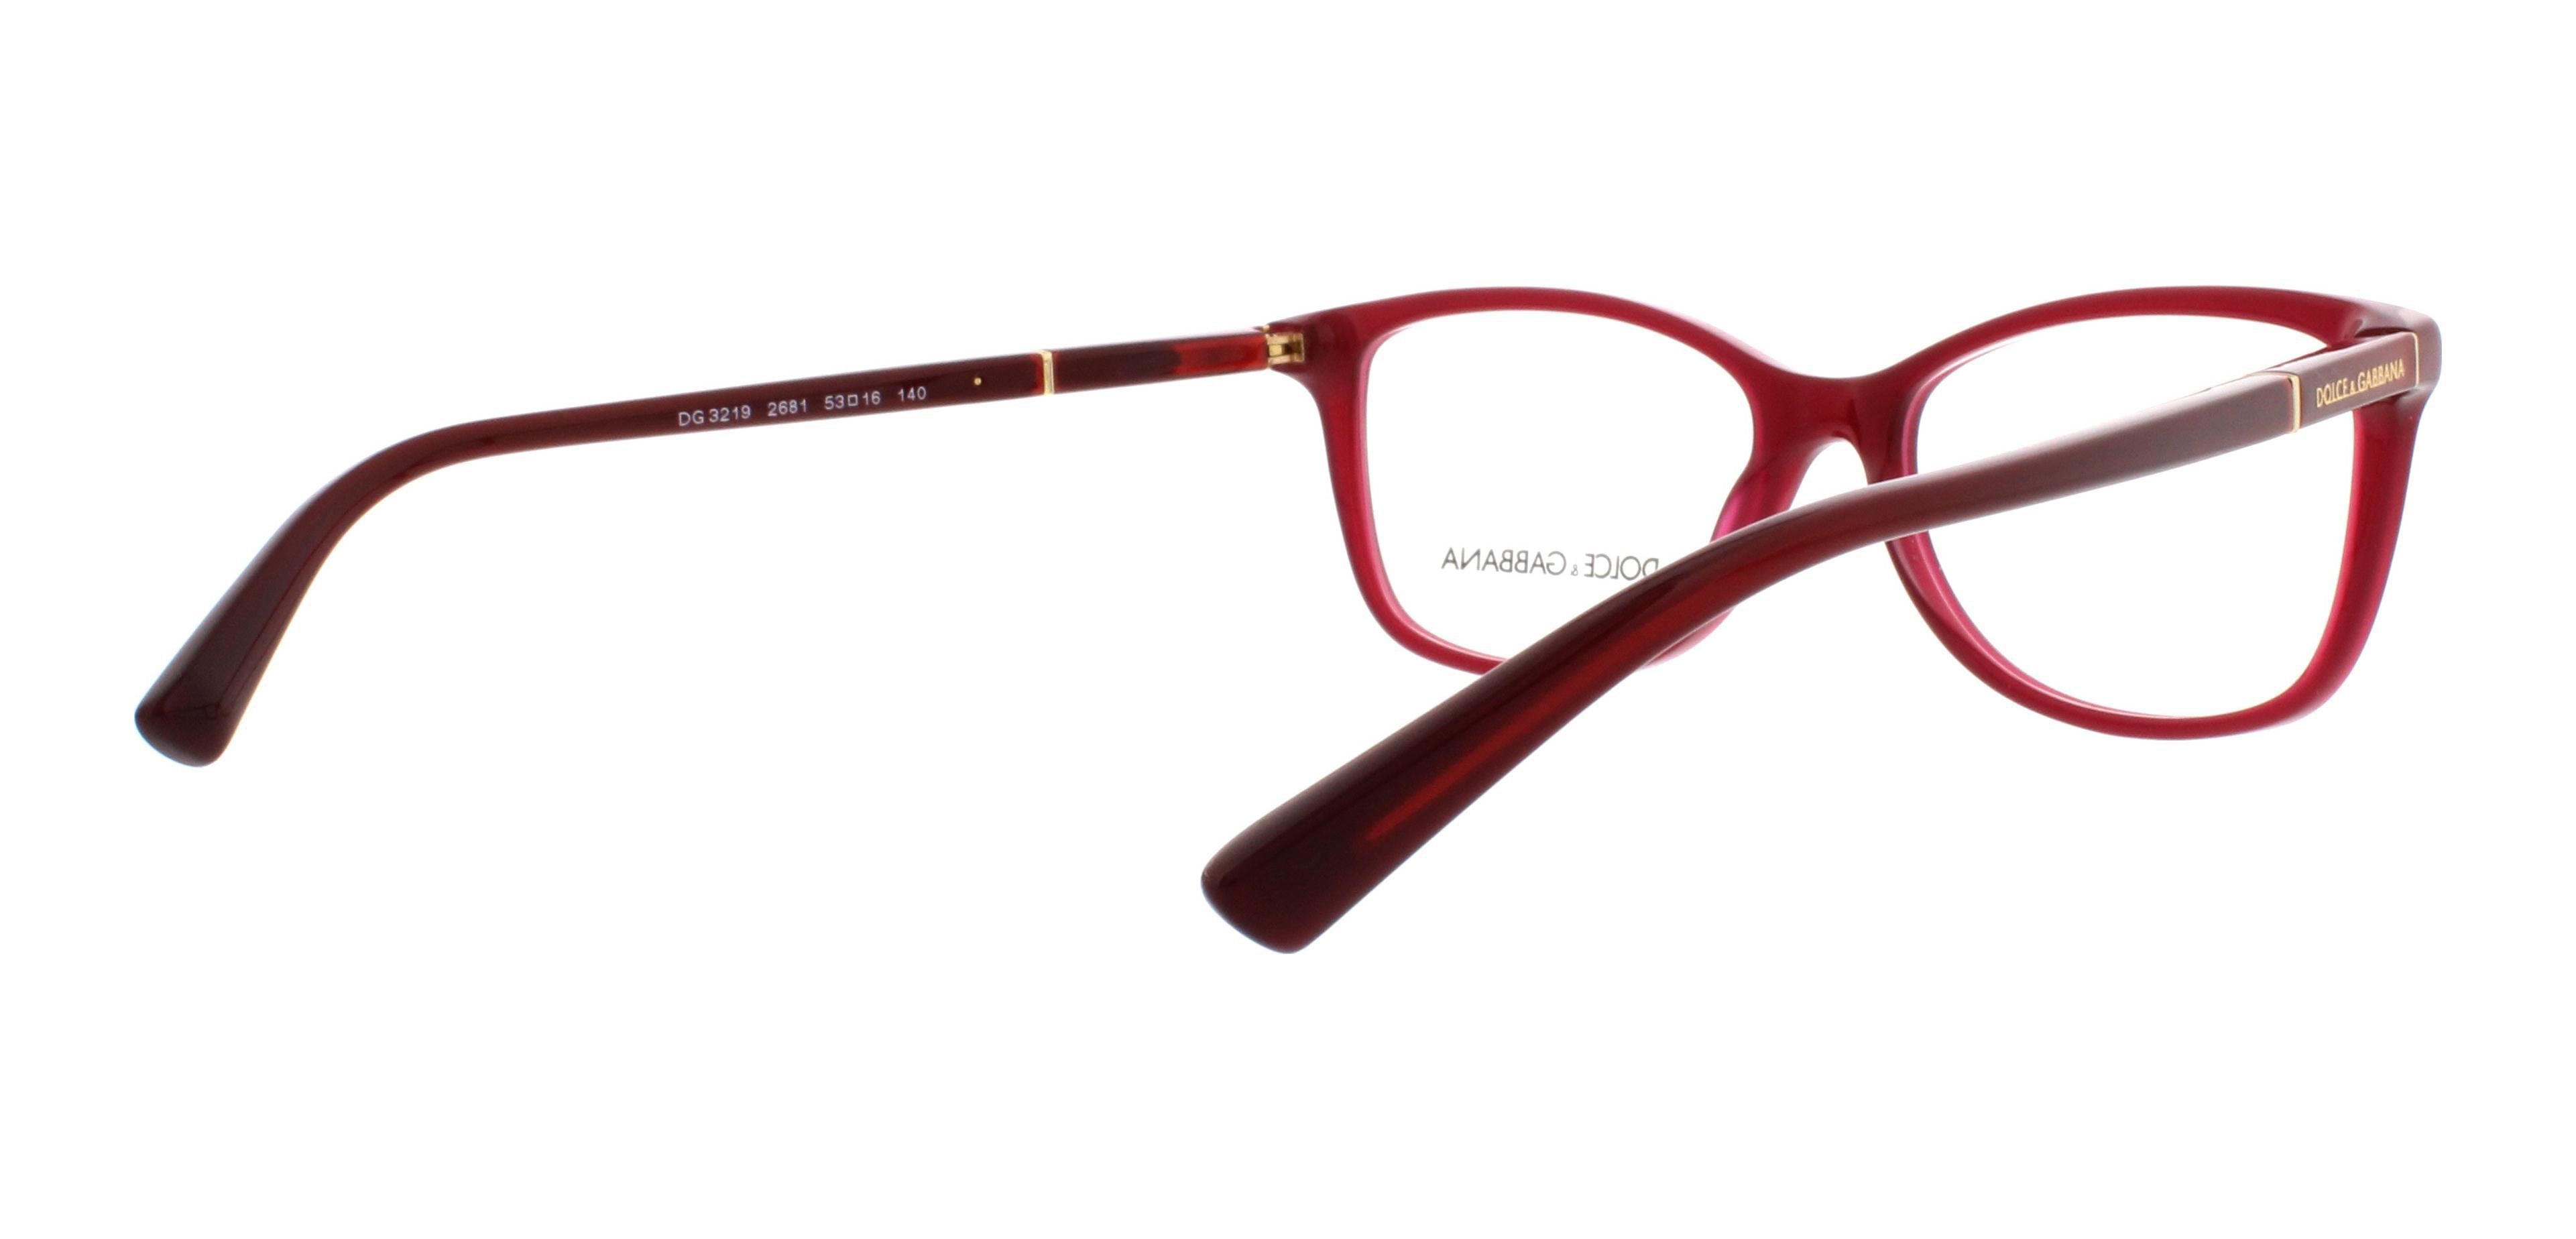 82e42f6286 DOLCE   GABBANA Eyeglasses DG 3219 2681 Opal Red 53MM - Walmart.com